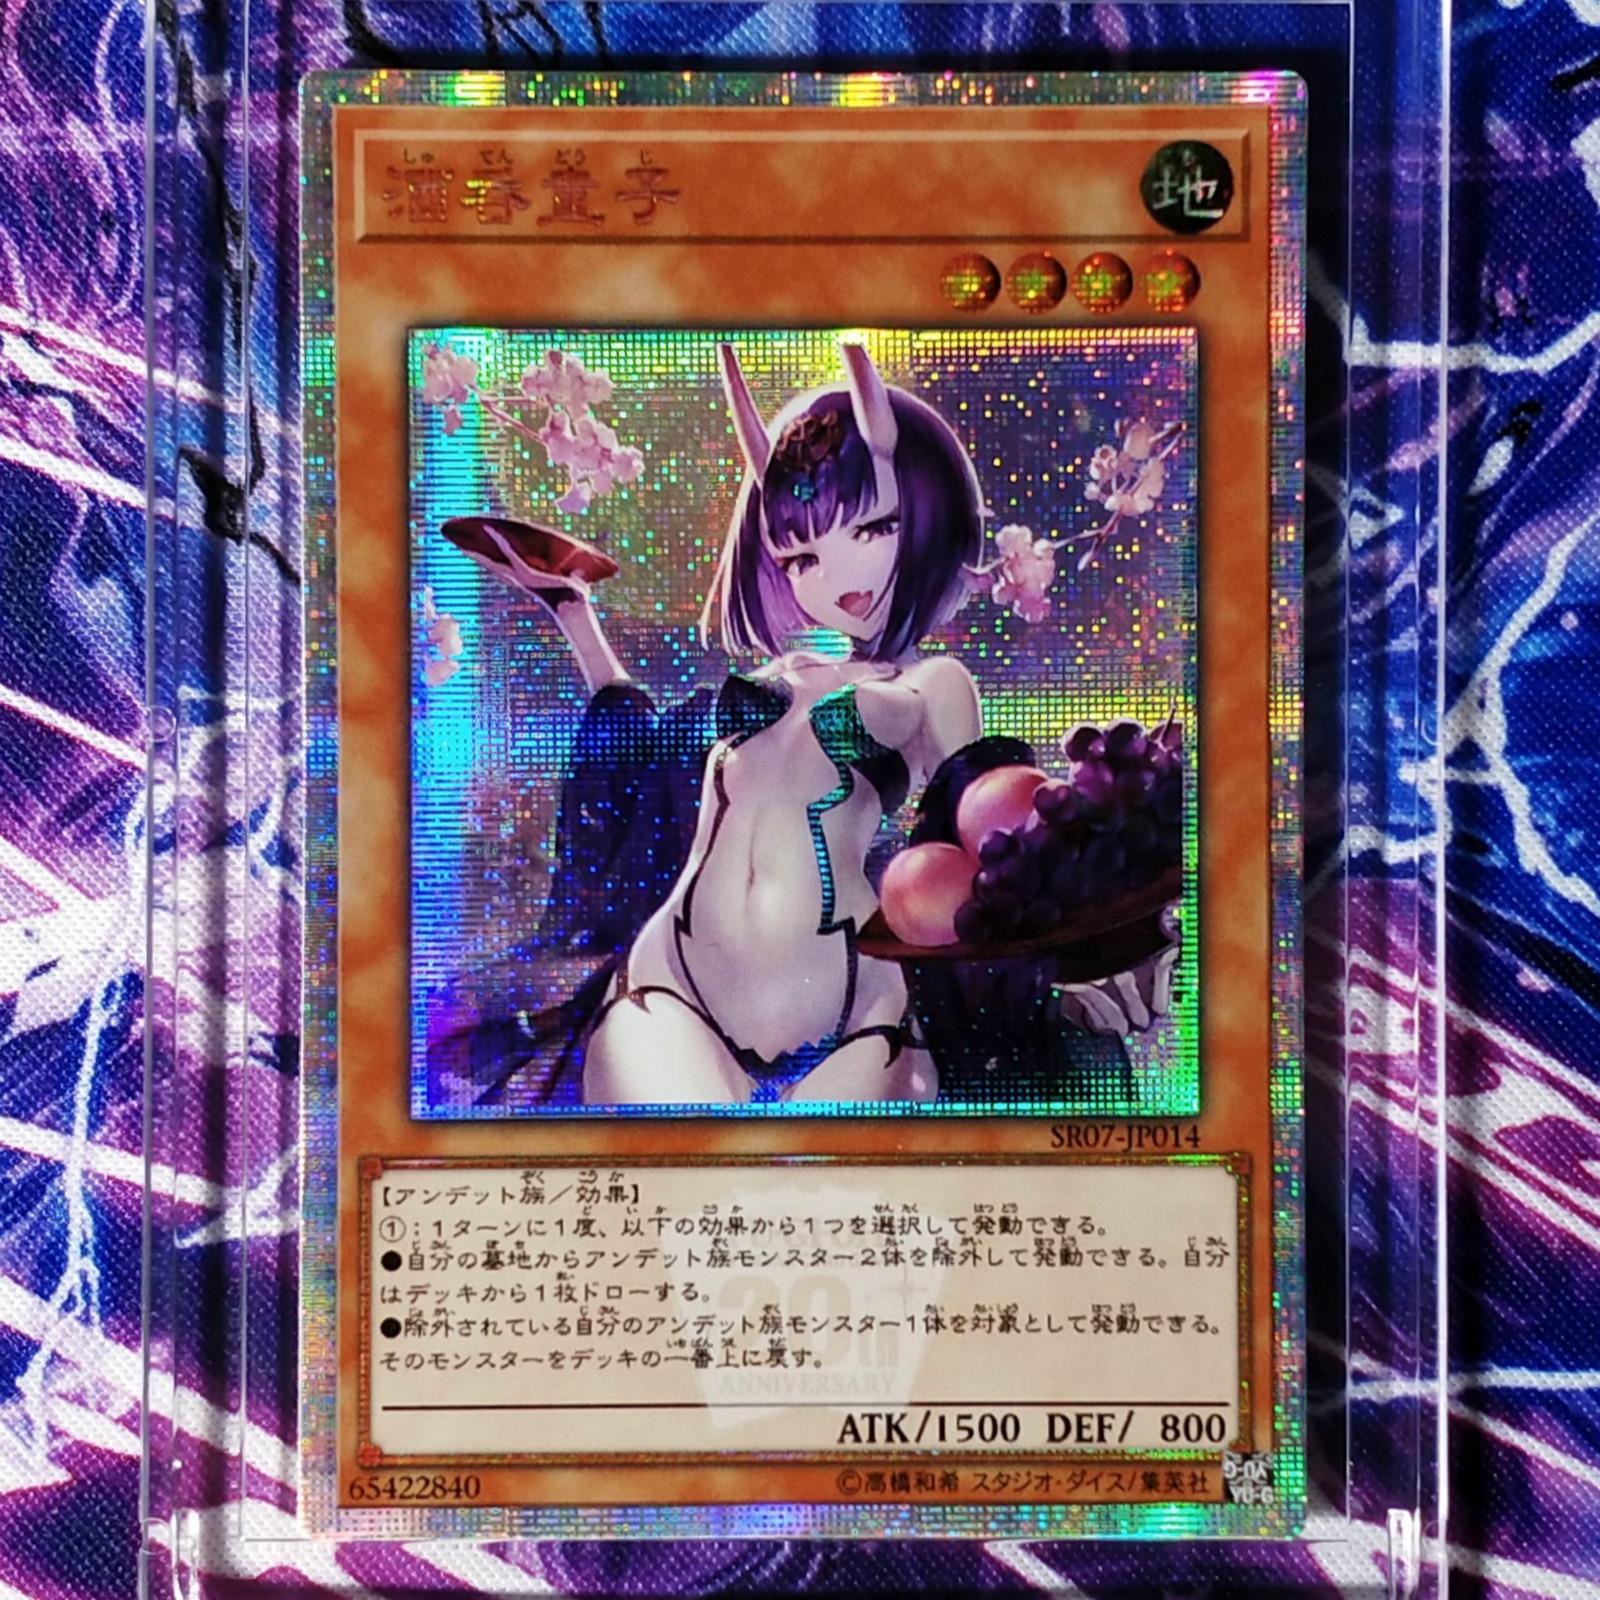 Yu Gi Oh DIY Shutendoji Colorful Toys Hobbies Hobby Collectibles Game Collection Anime Cards